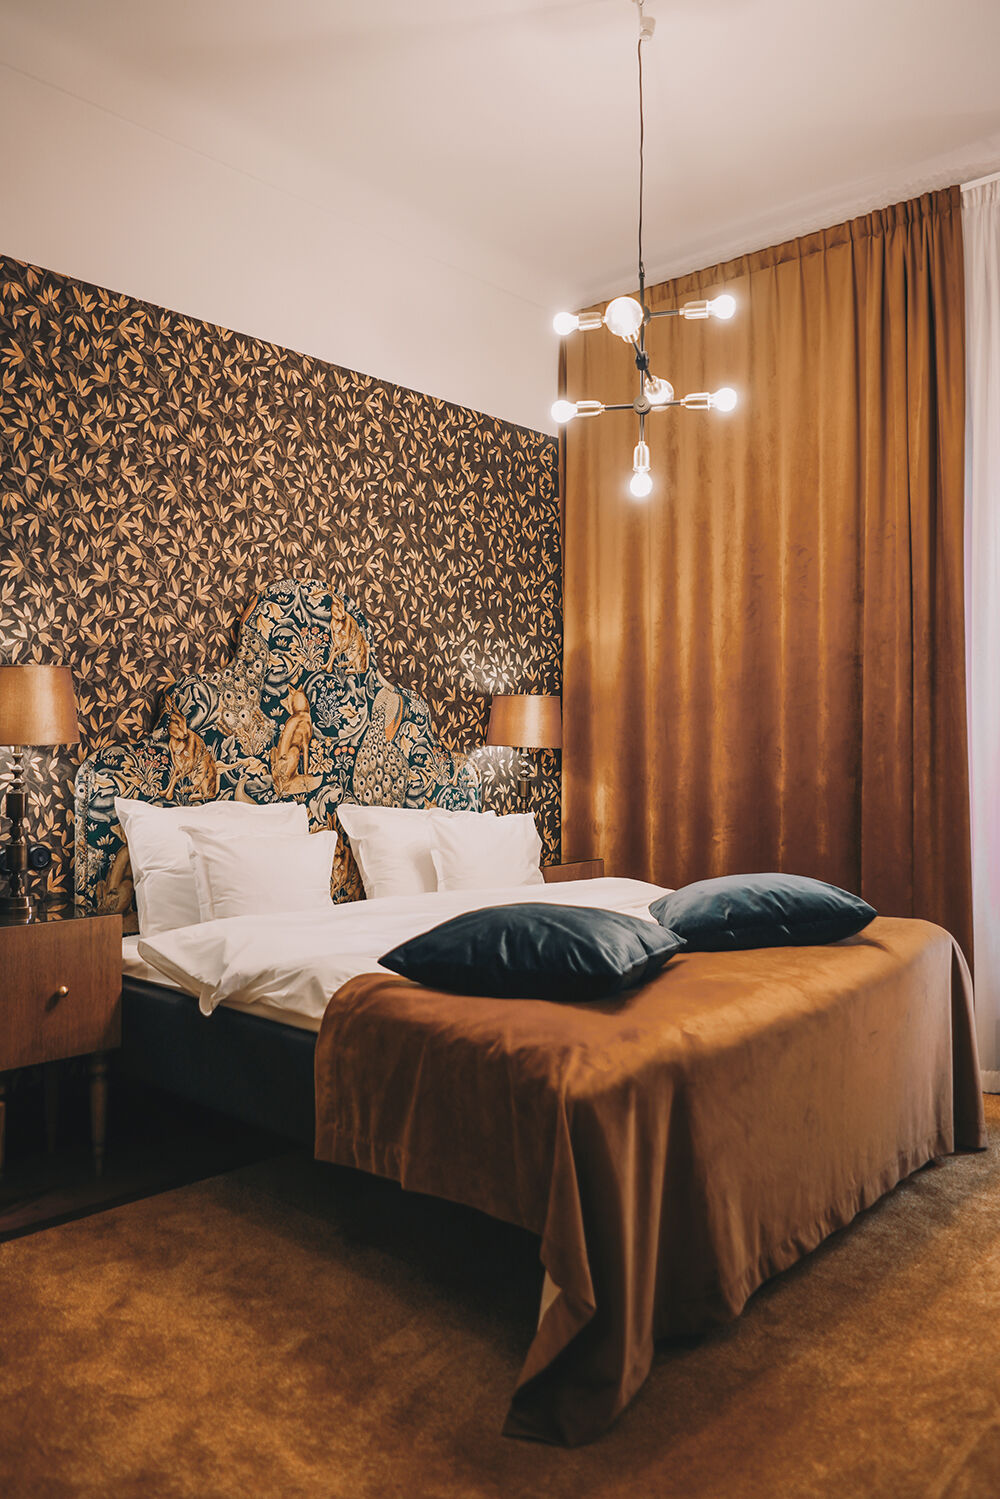 vanja wikström nofo hotel mysigt hotell södermalm stockholm 15